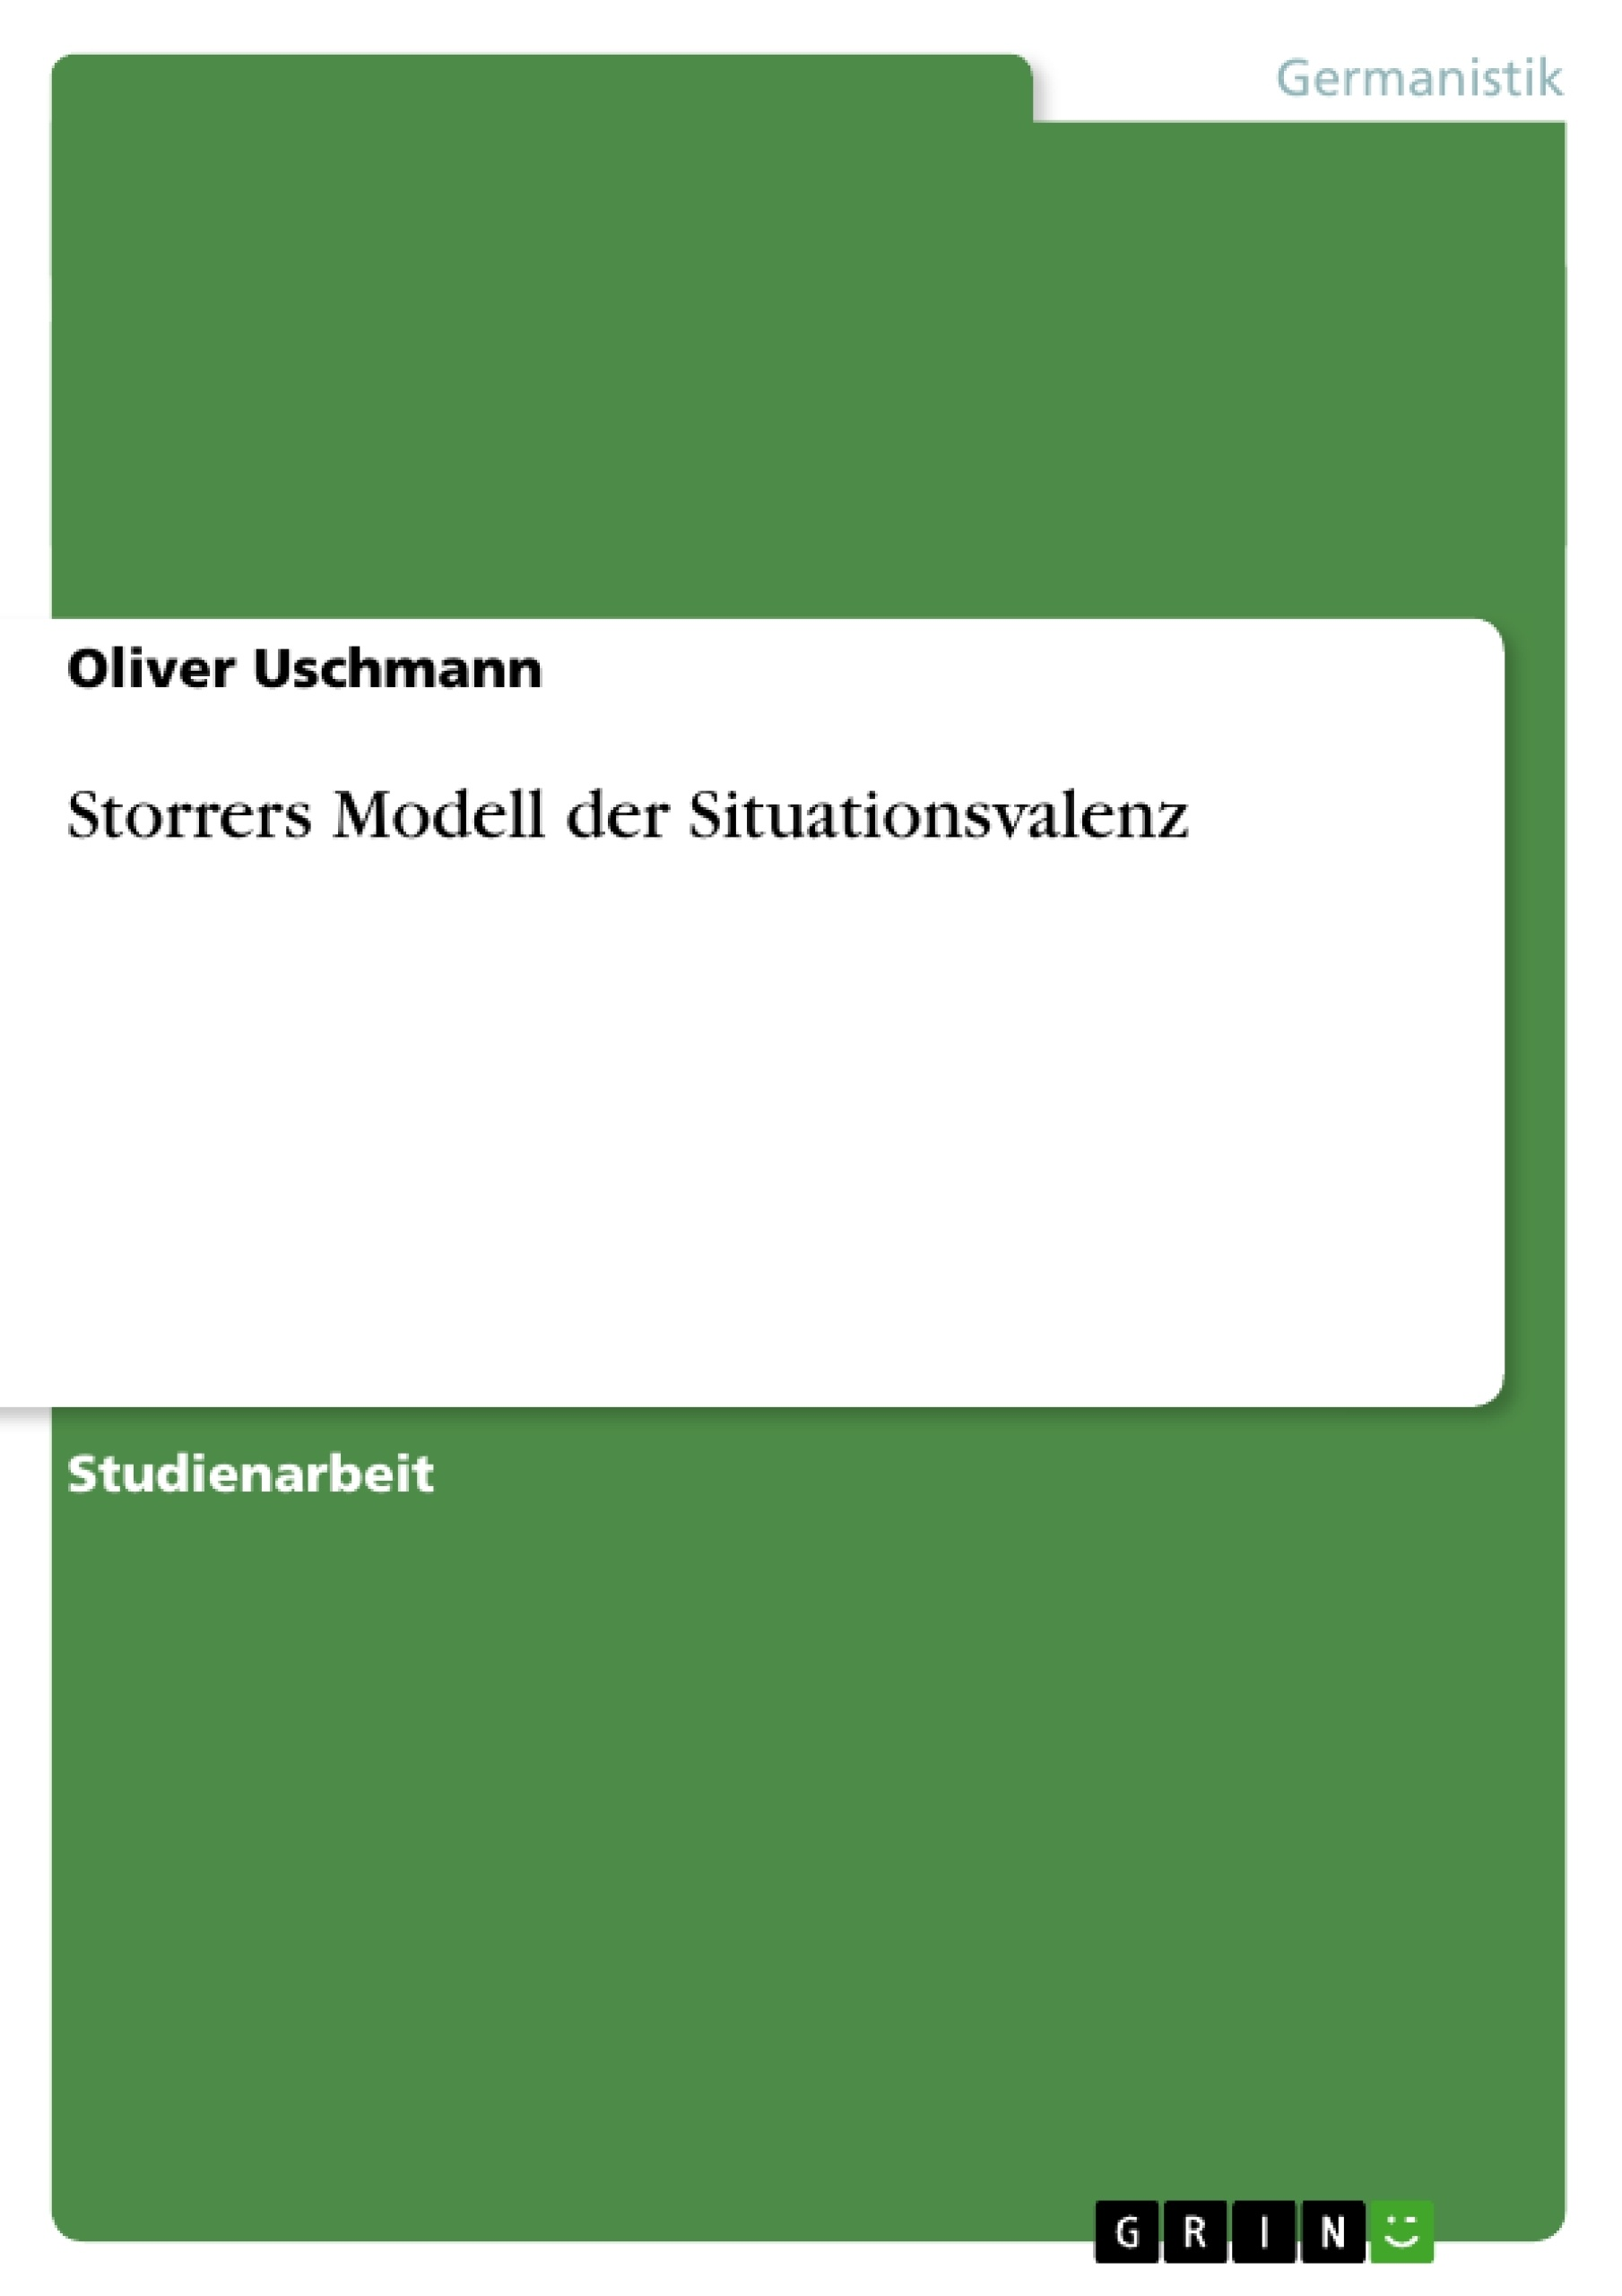 Titel: Storrers Modell der Situationsvalenz